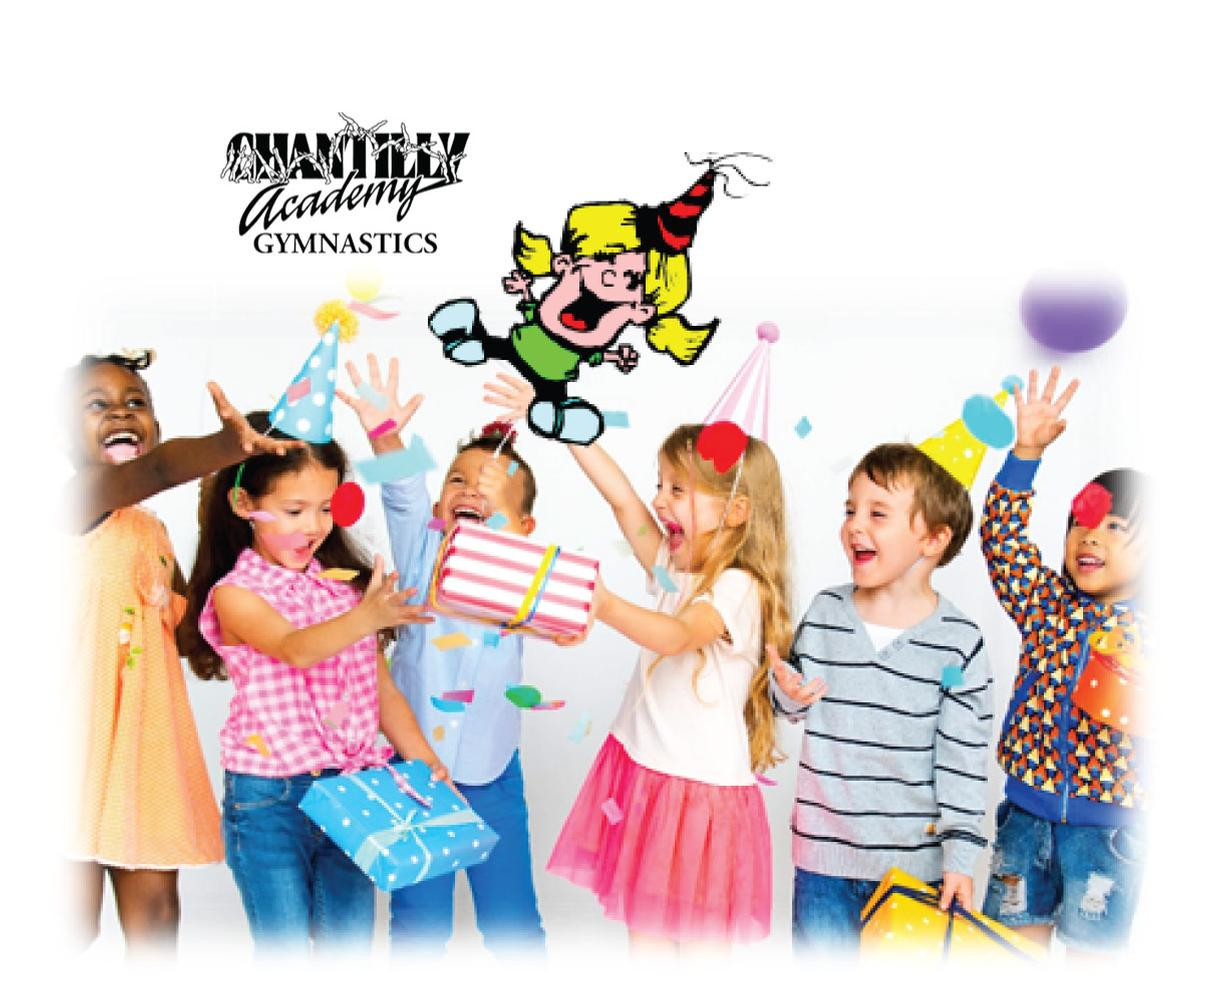 Chantilly Academy Gymnastics Blast Birthday Party